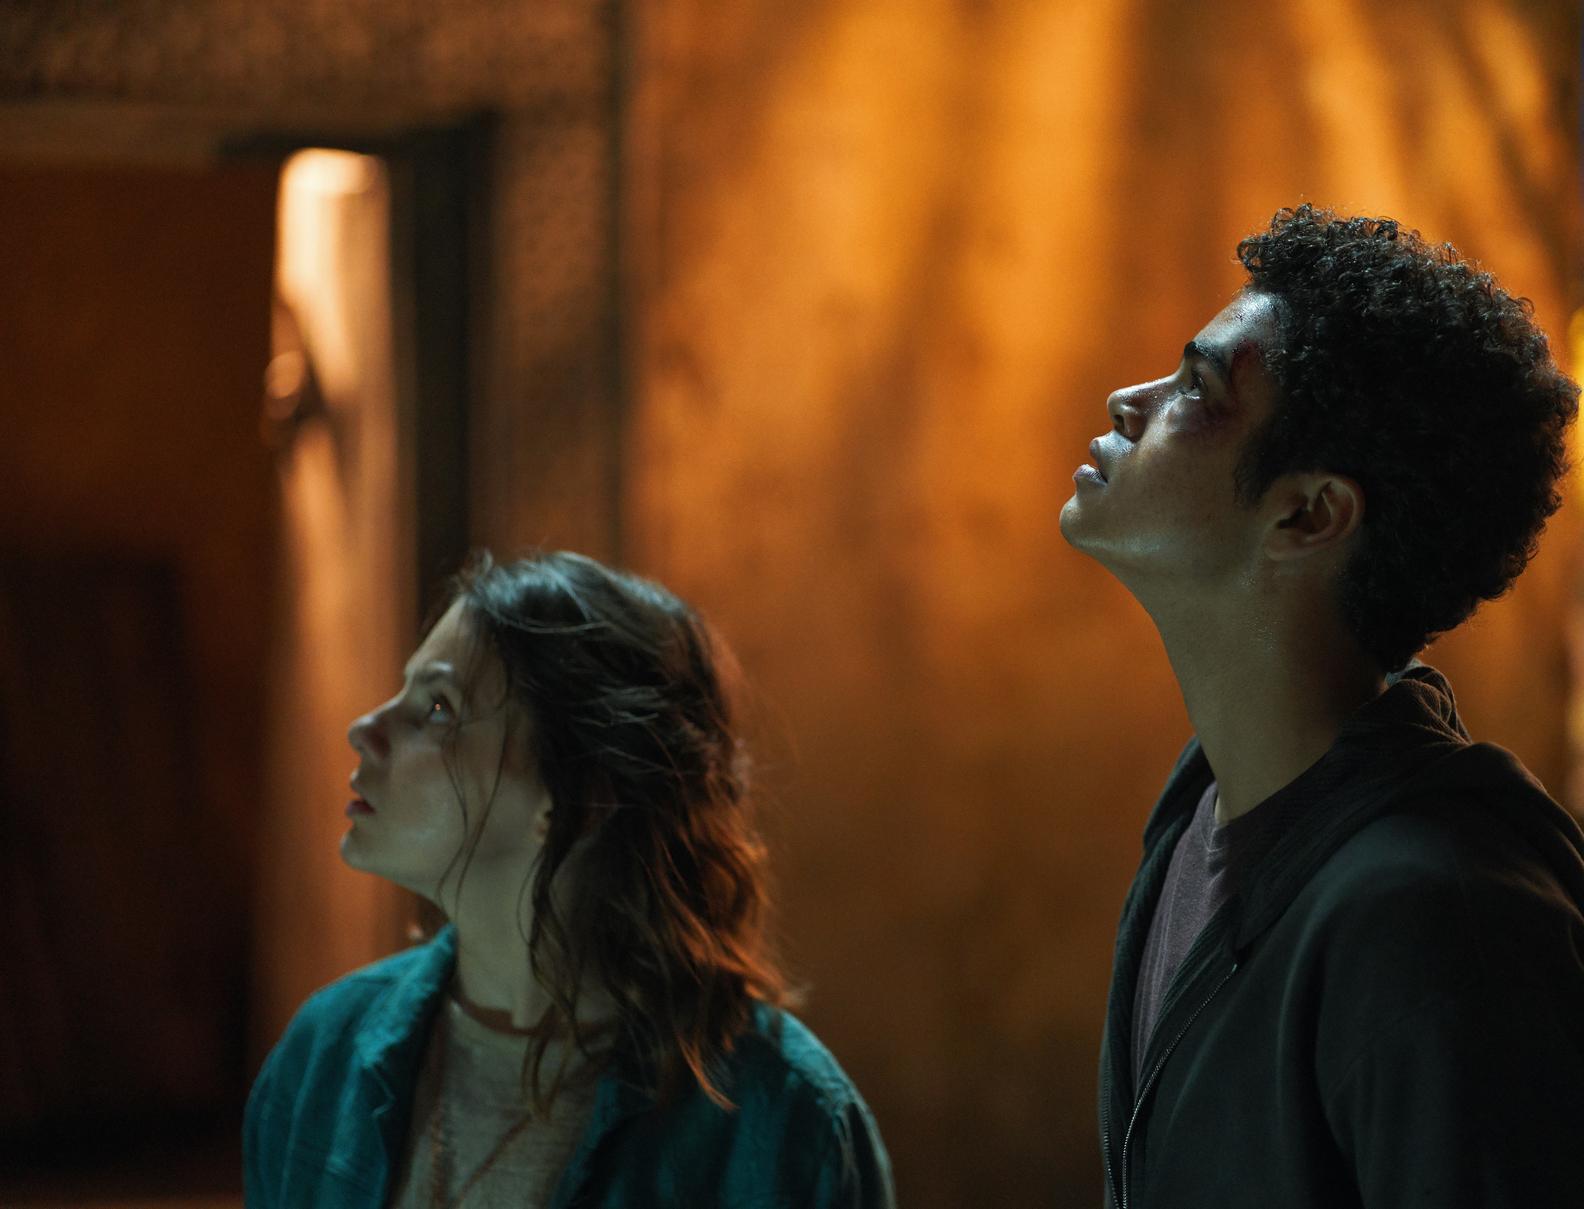 His Dark Materials - Will and Lyra look up